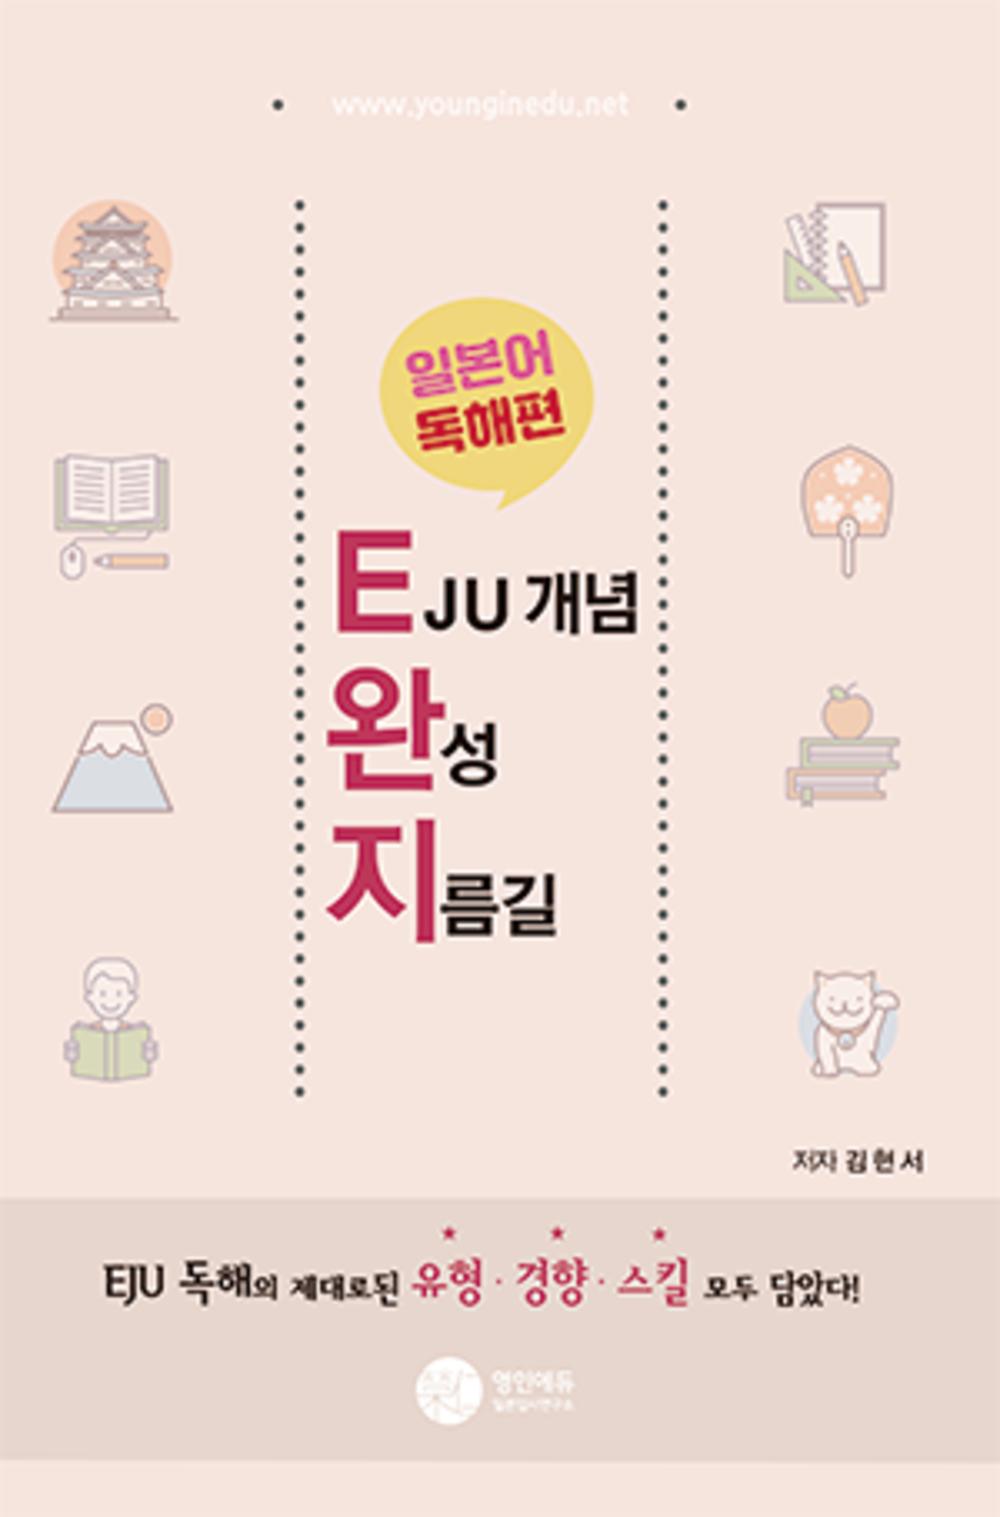 E완지(Eju 개념완성 지름길)_일본어 독해편  (교재만 개별 구매  불가)